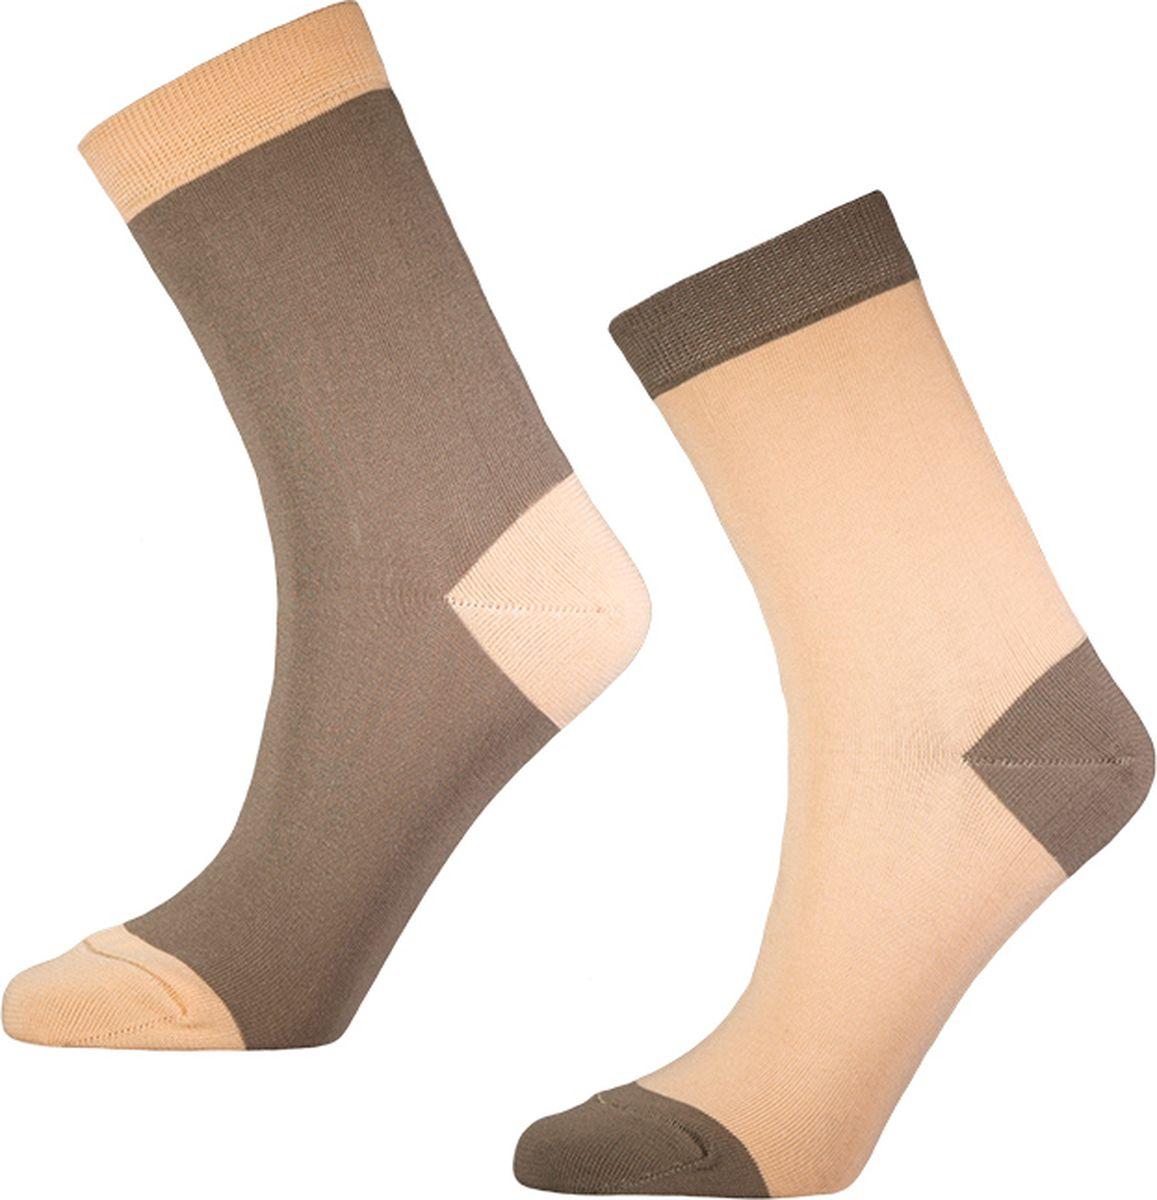 Носки мужские Big Bang Socks, цвет: персиковый, коричневый, 2 пары. d421. Размер 40/44 носки minecraft socks 3 pack green зеленые s 3 пары 11750